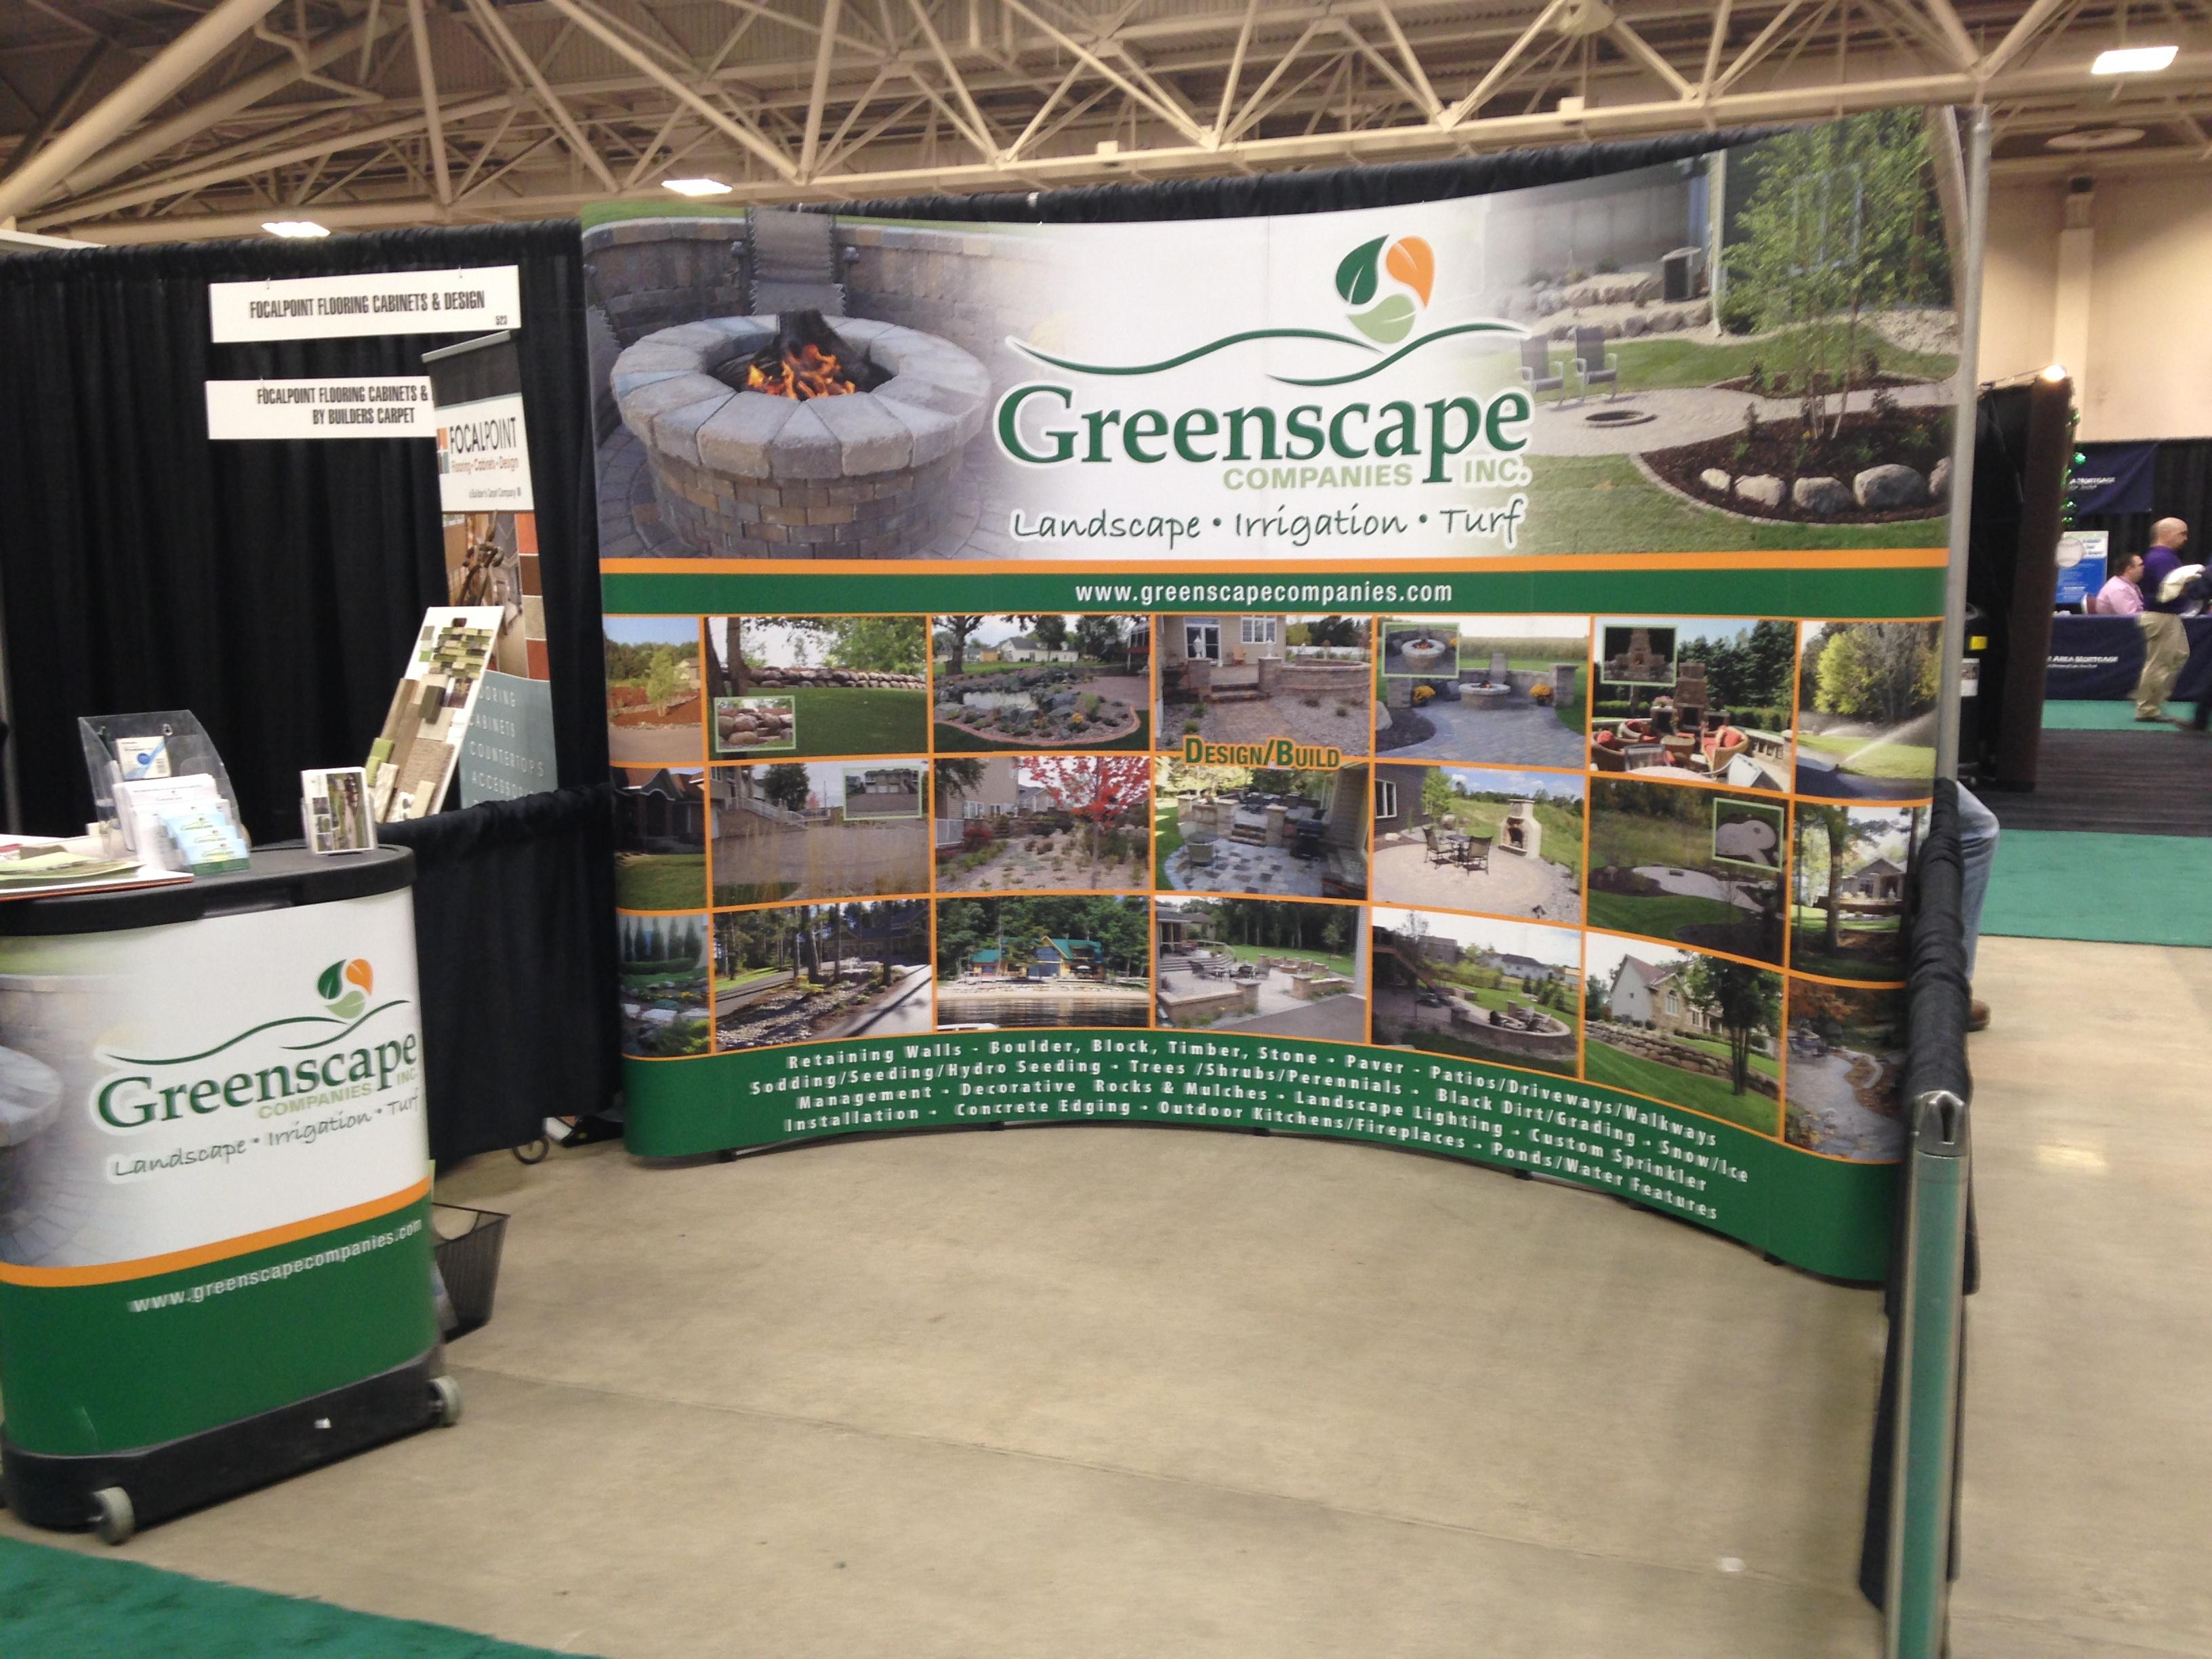 Greenscape Companies, Landscape, Irrigation, Turf